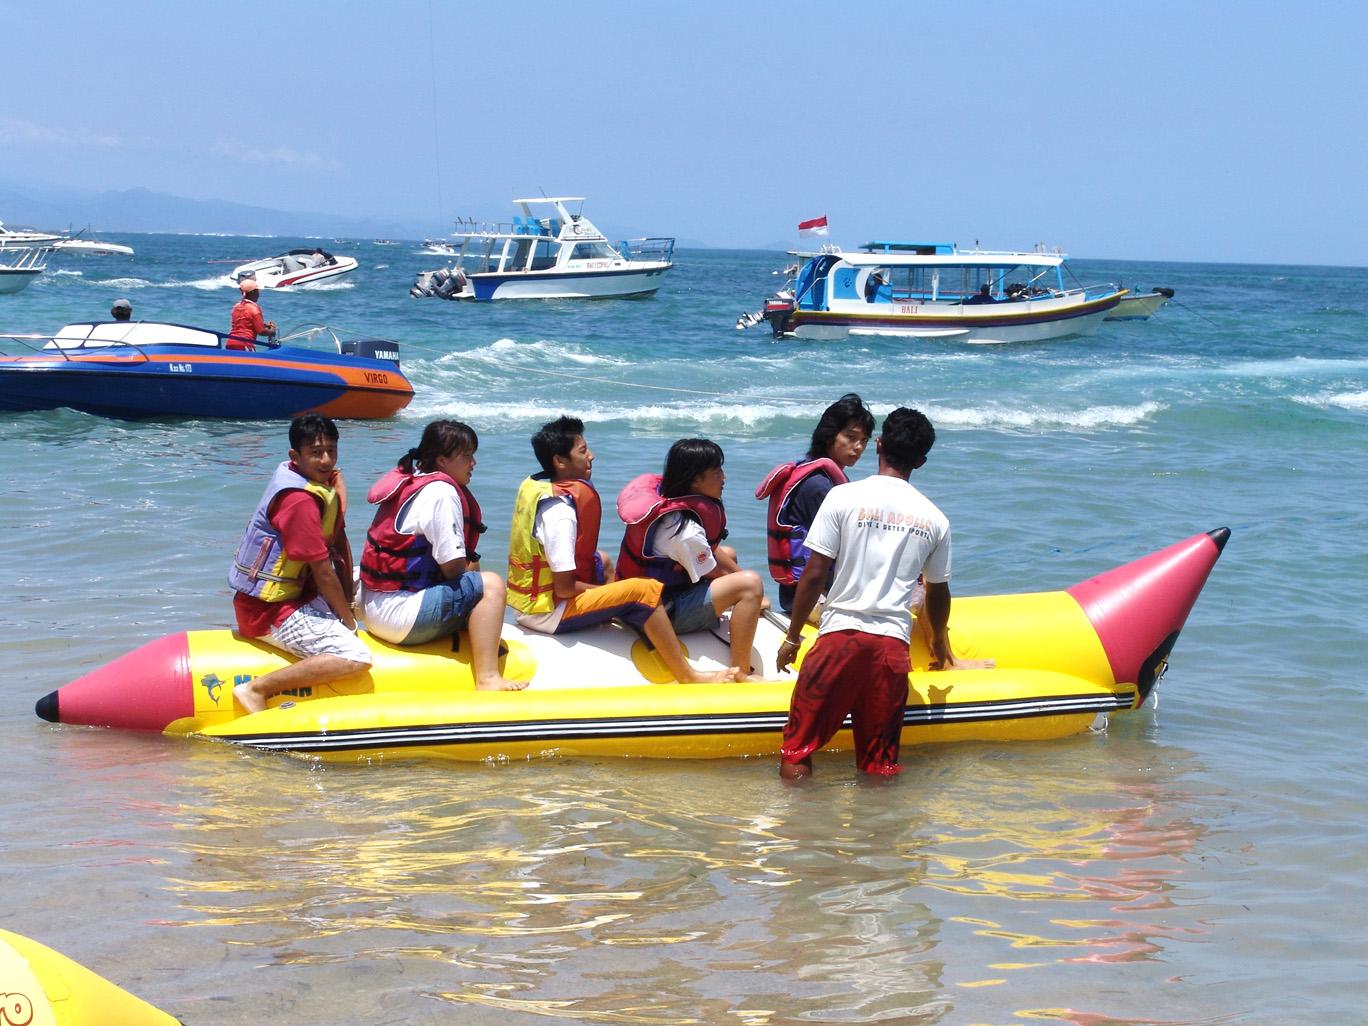 http://2.bp.blogspot.com/_PAJSBl1iryk/TT0h_u2egbI/AAAAAAAAAAs/YgNHvDNye9Q/s1600/tanjung+benoa+banana+boat.jpg